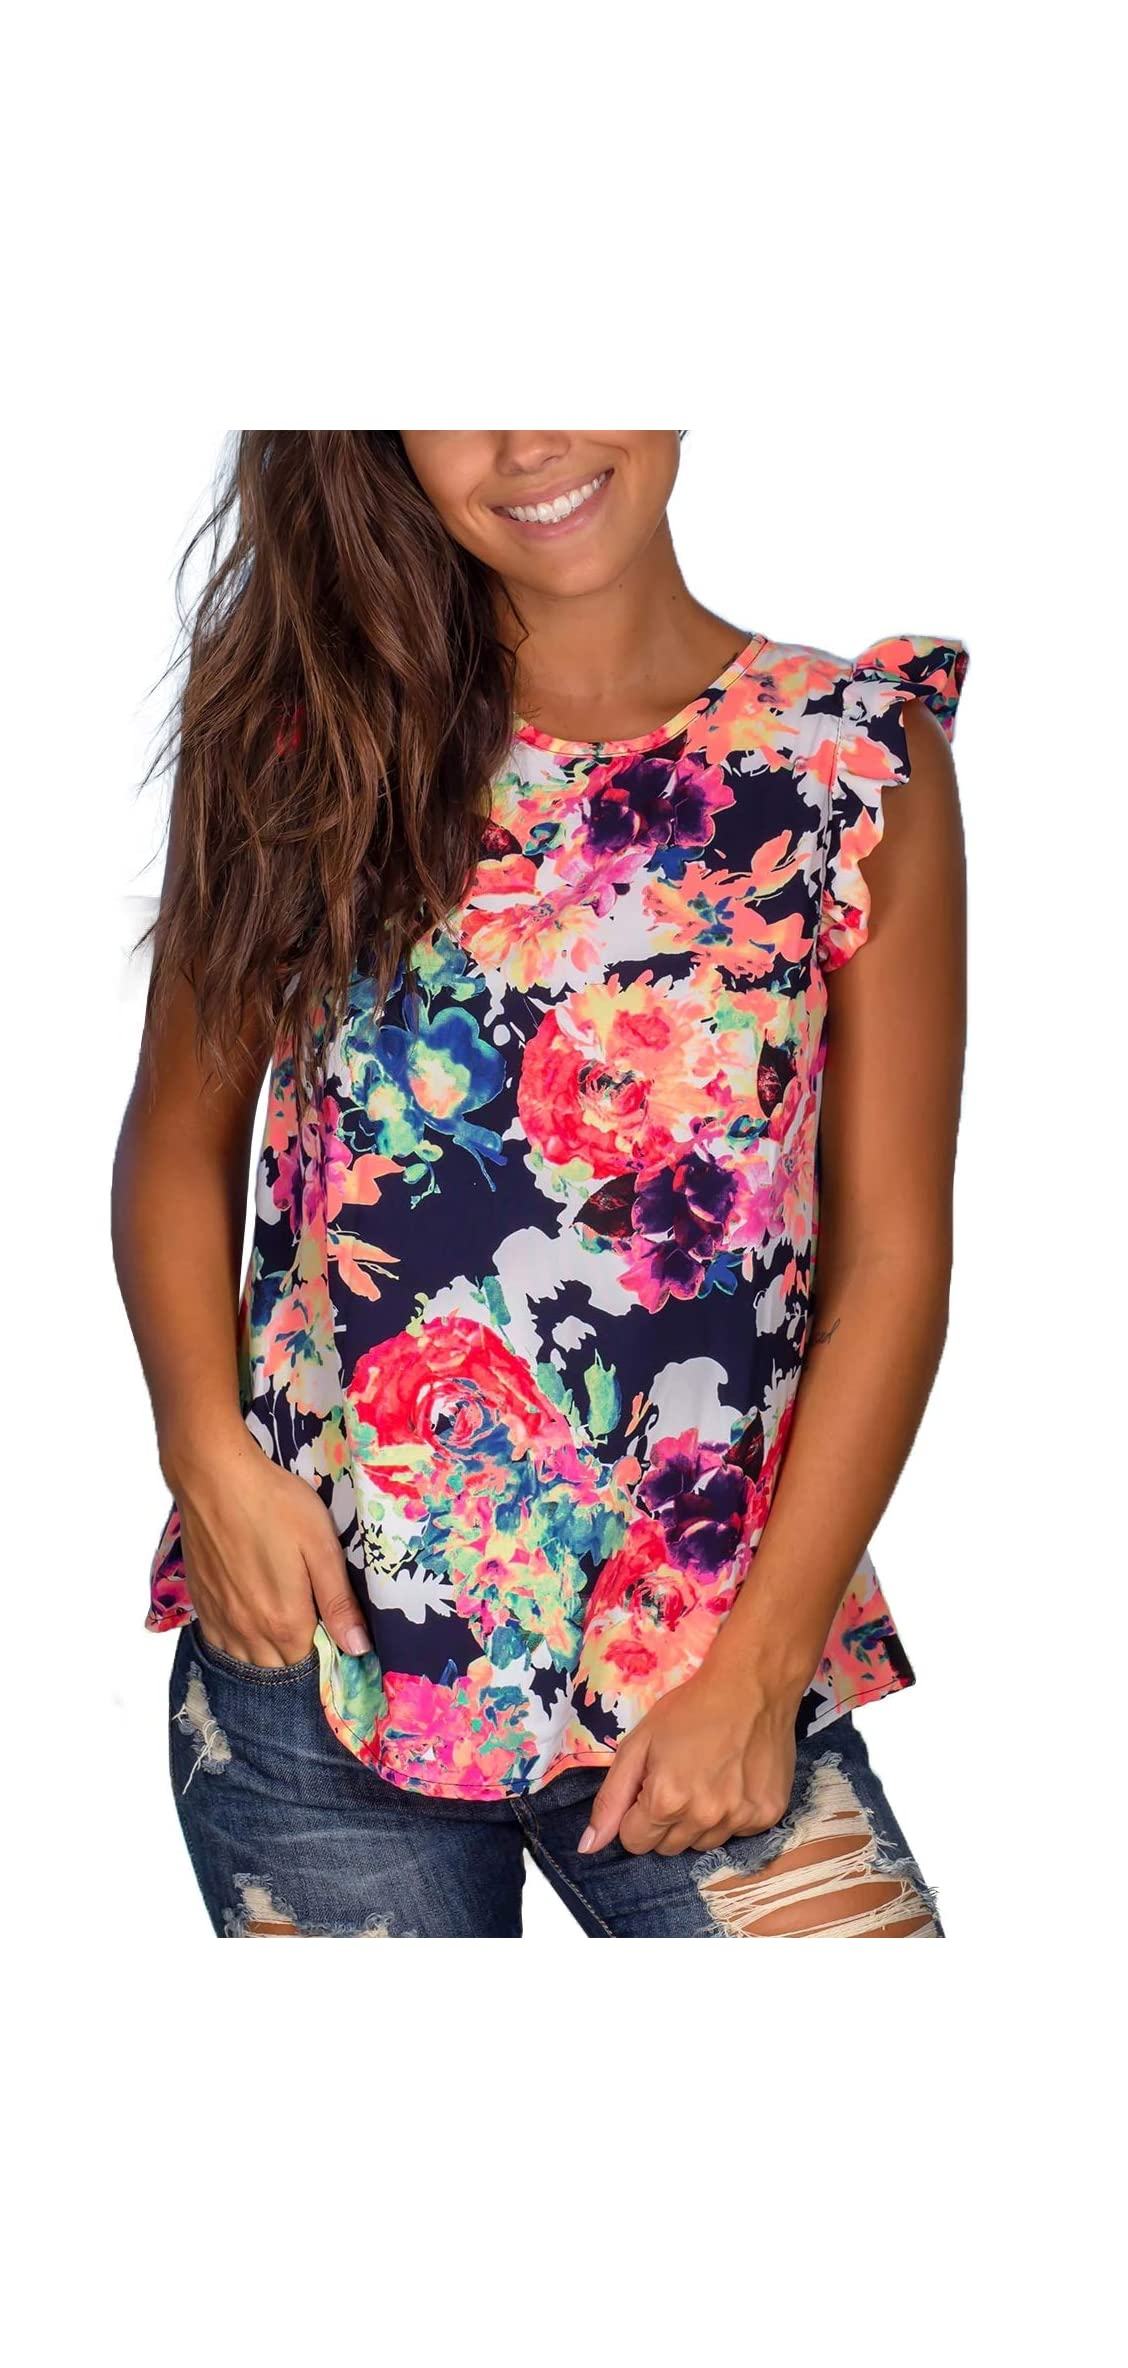 Womens Tank Tops Loose Fit Sleeveless Shirt Casual